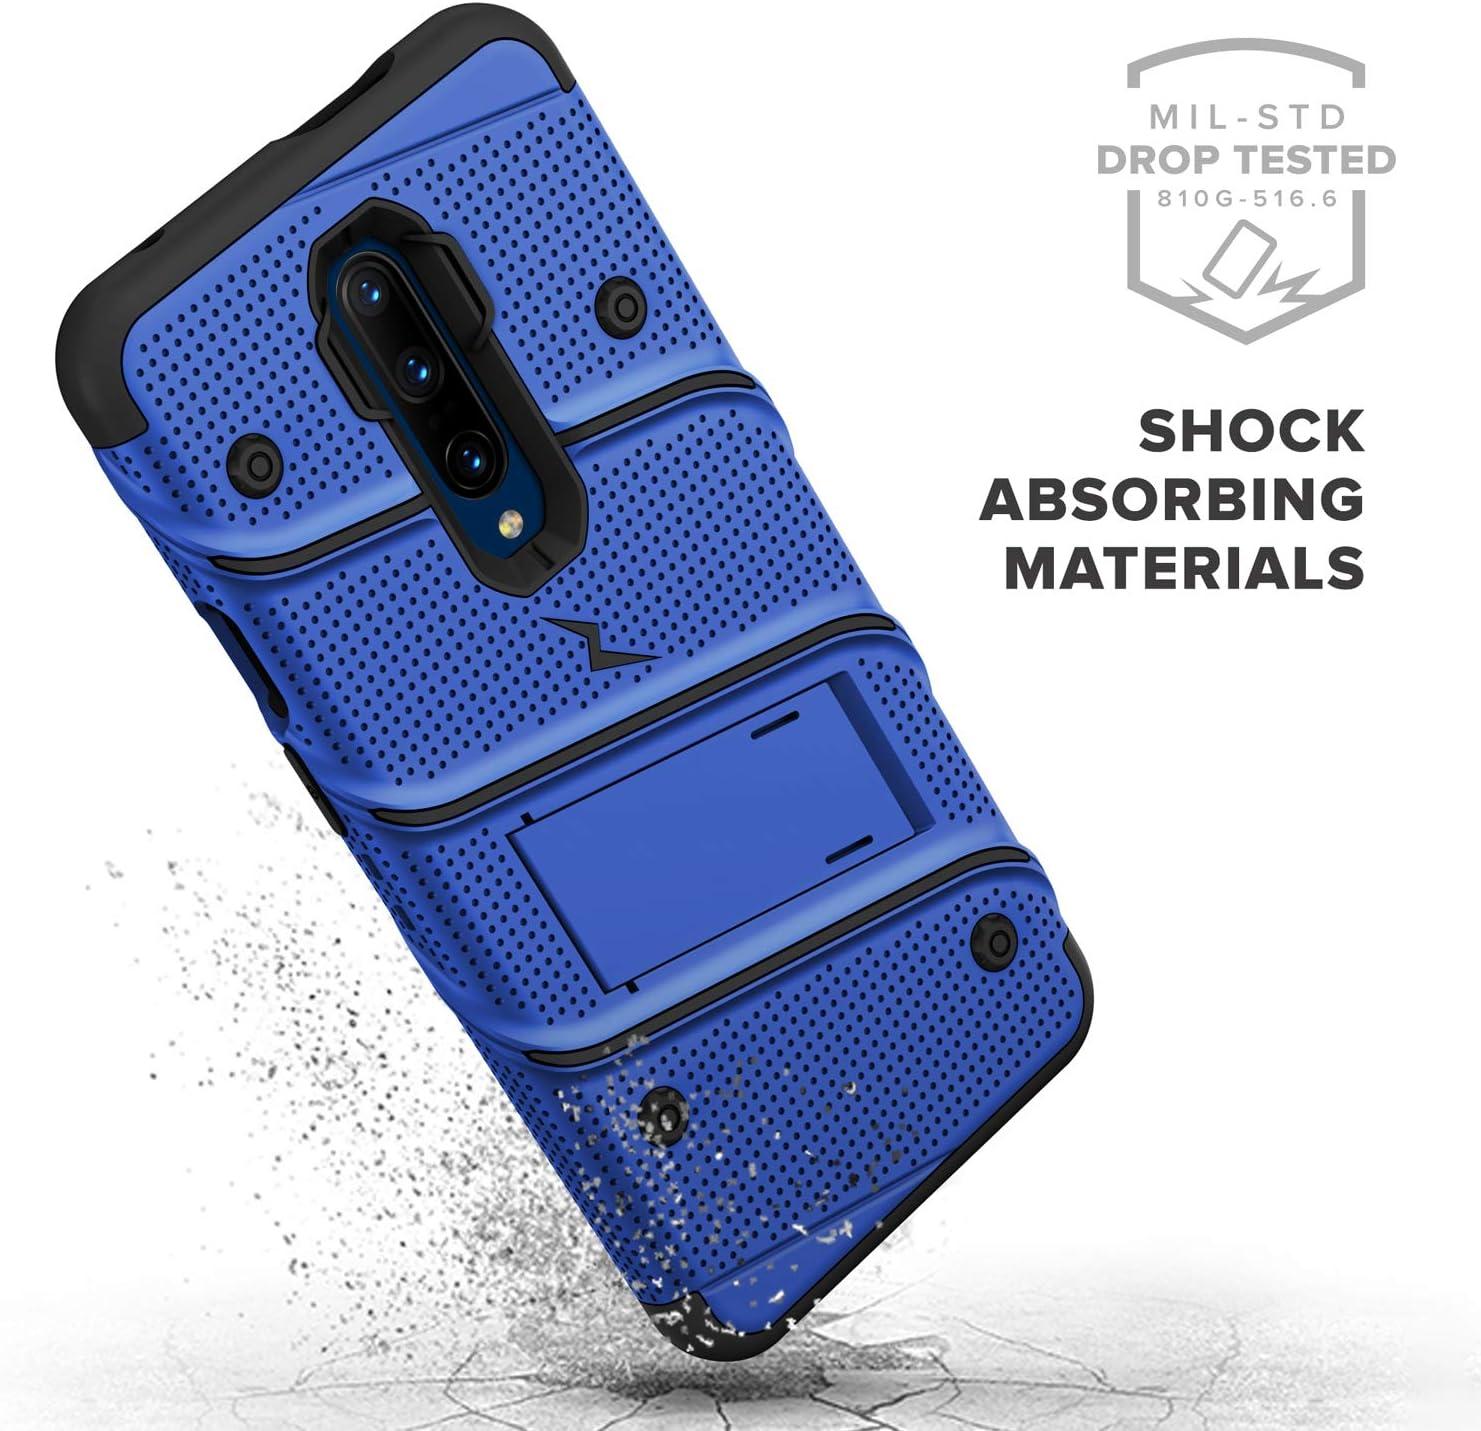 ZIZO Bolt Heavy-Duty OnePlus 7 Pro Case Lanyard Blue Black Military-Grade Drop Protection w//Kickstand Bundle Includes Belt Clip Holster